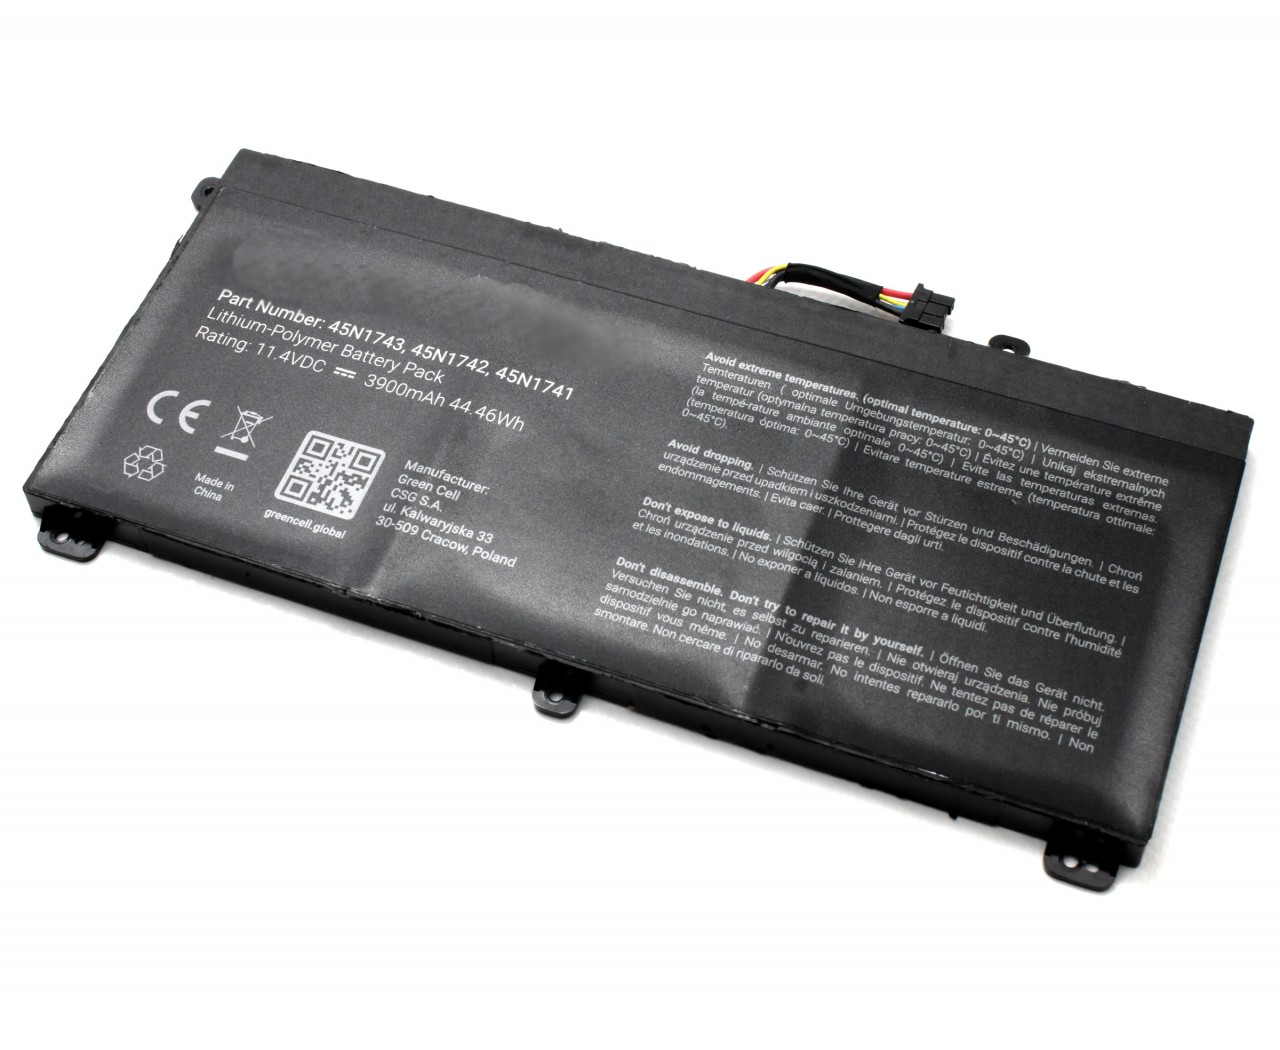 Baterie Lenovo 3ICP7 62 66 3900mAh imagine powerlaptop.ro 2021